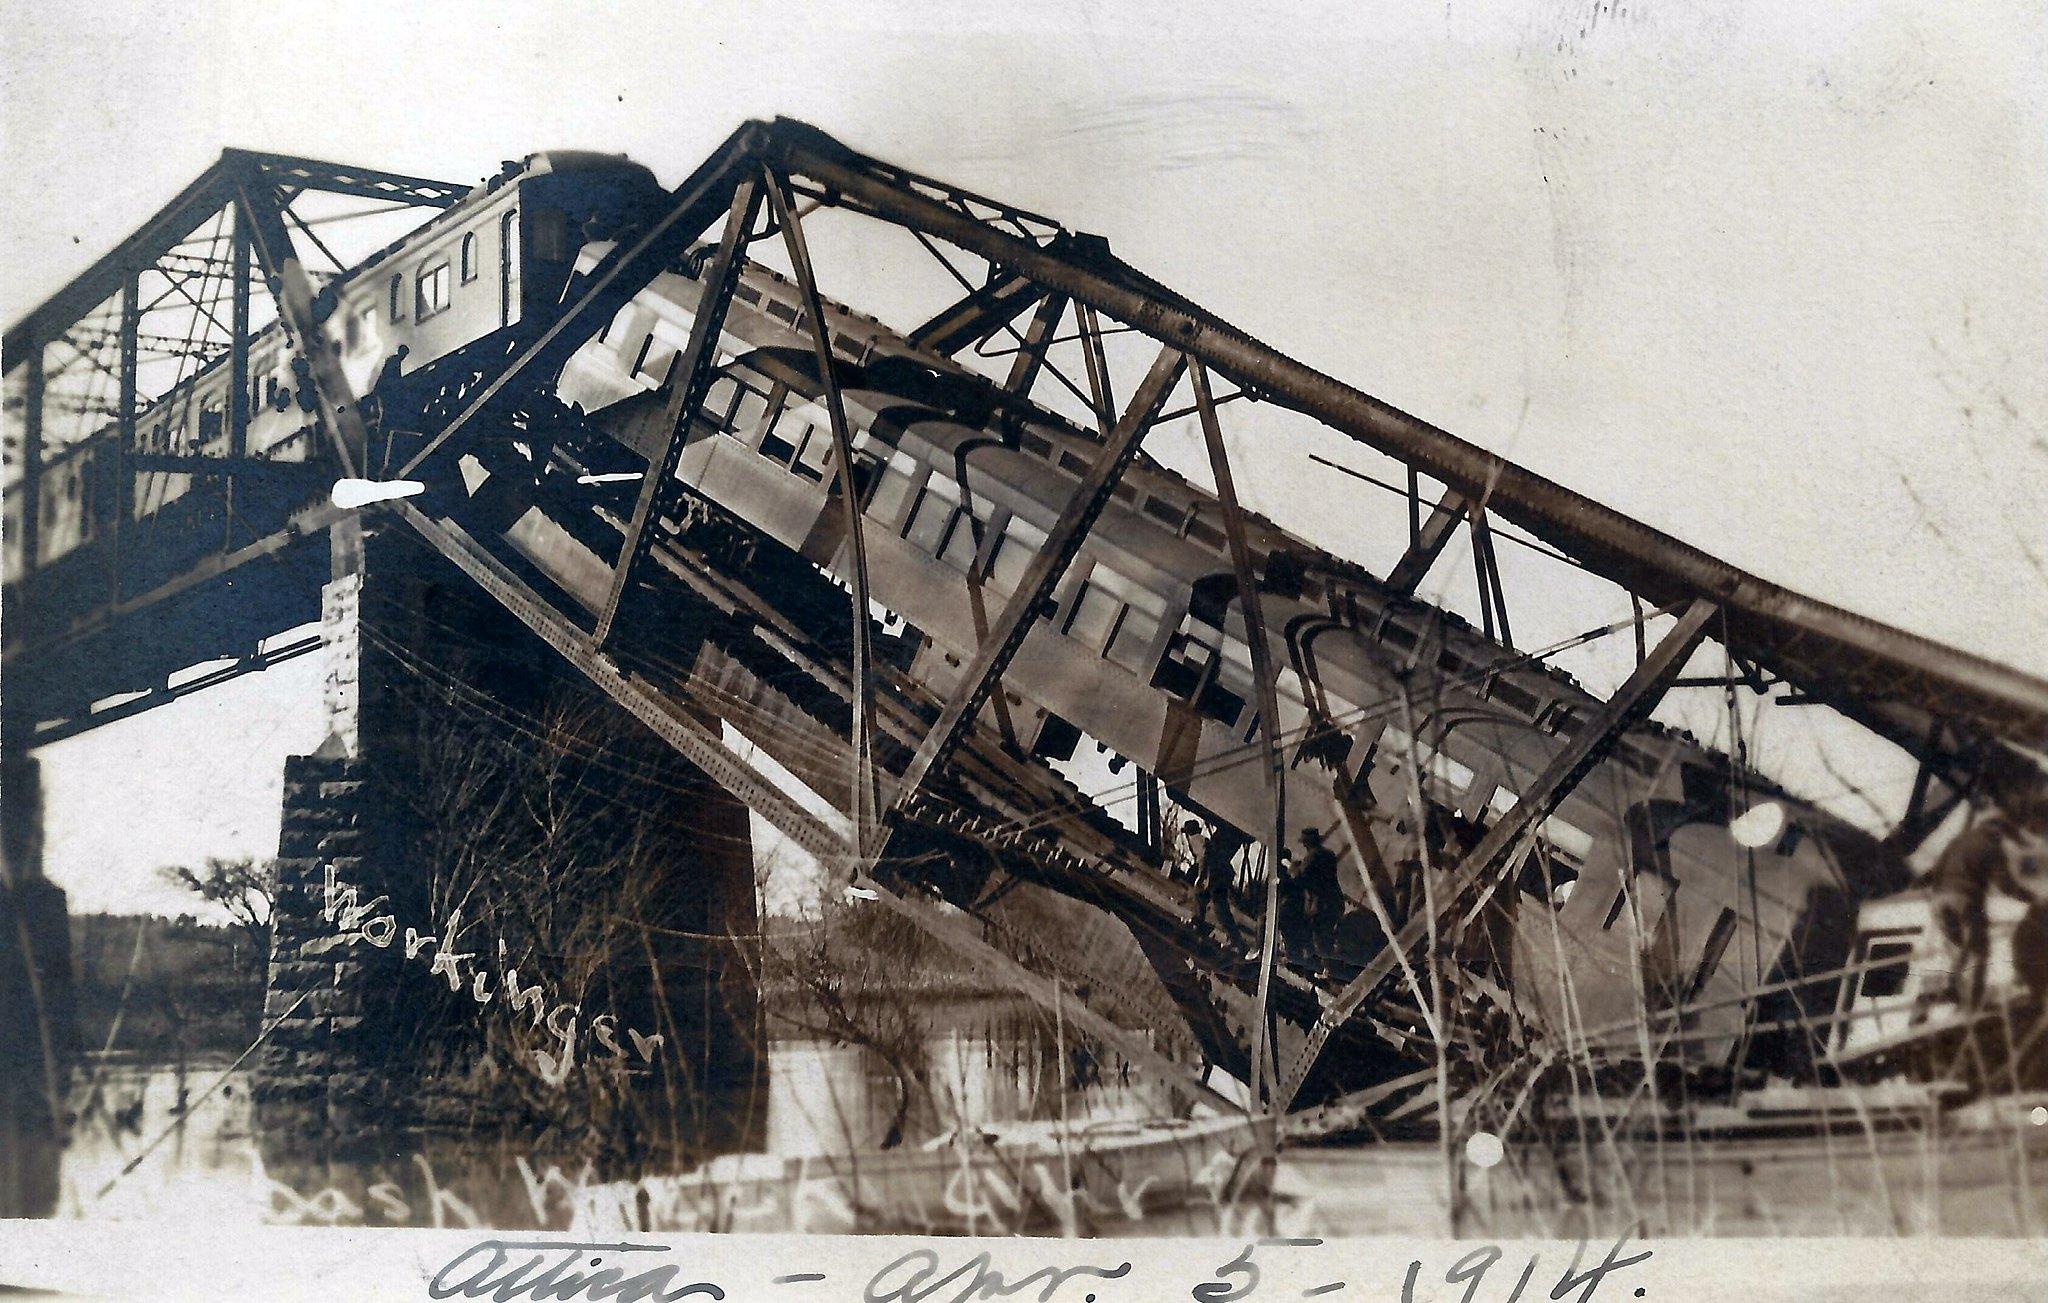 Attica Indiana Train Wreck Wabash Railroad Bridge